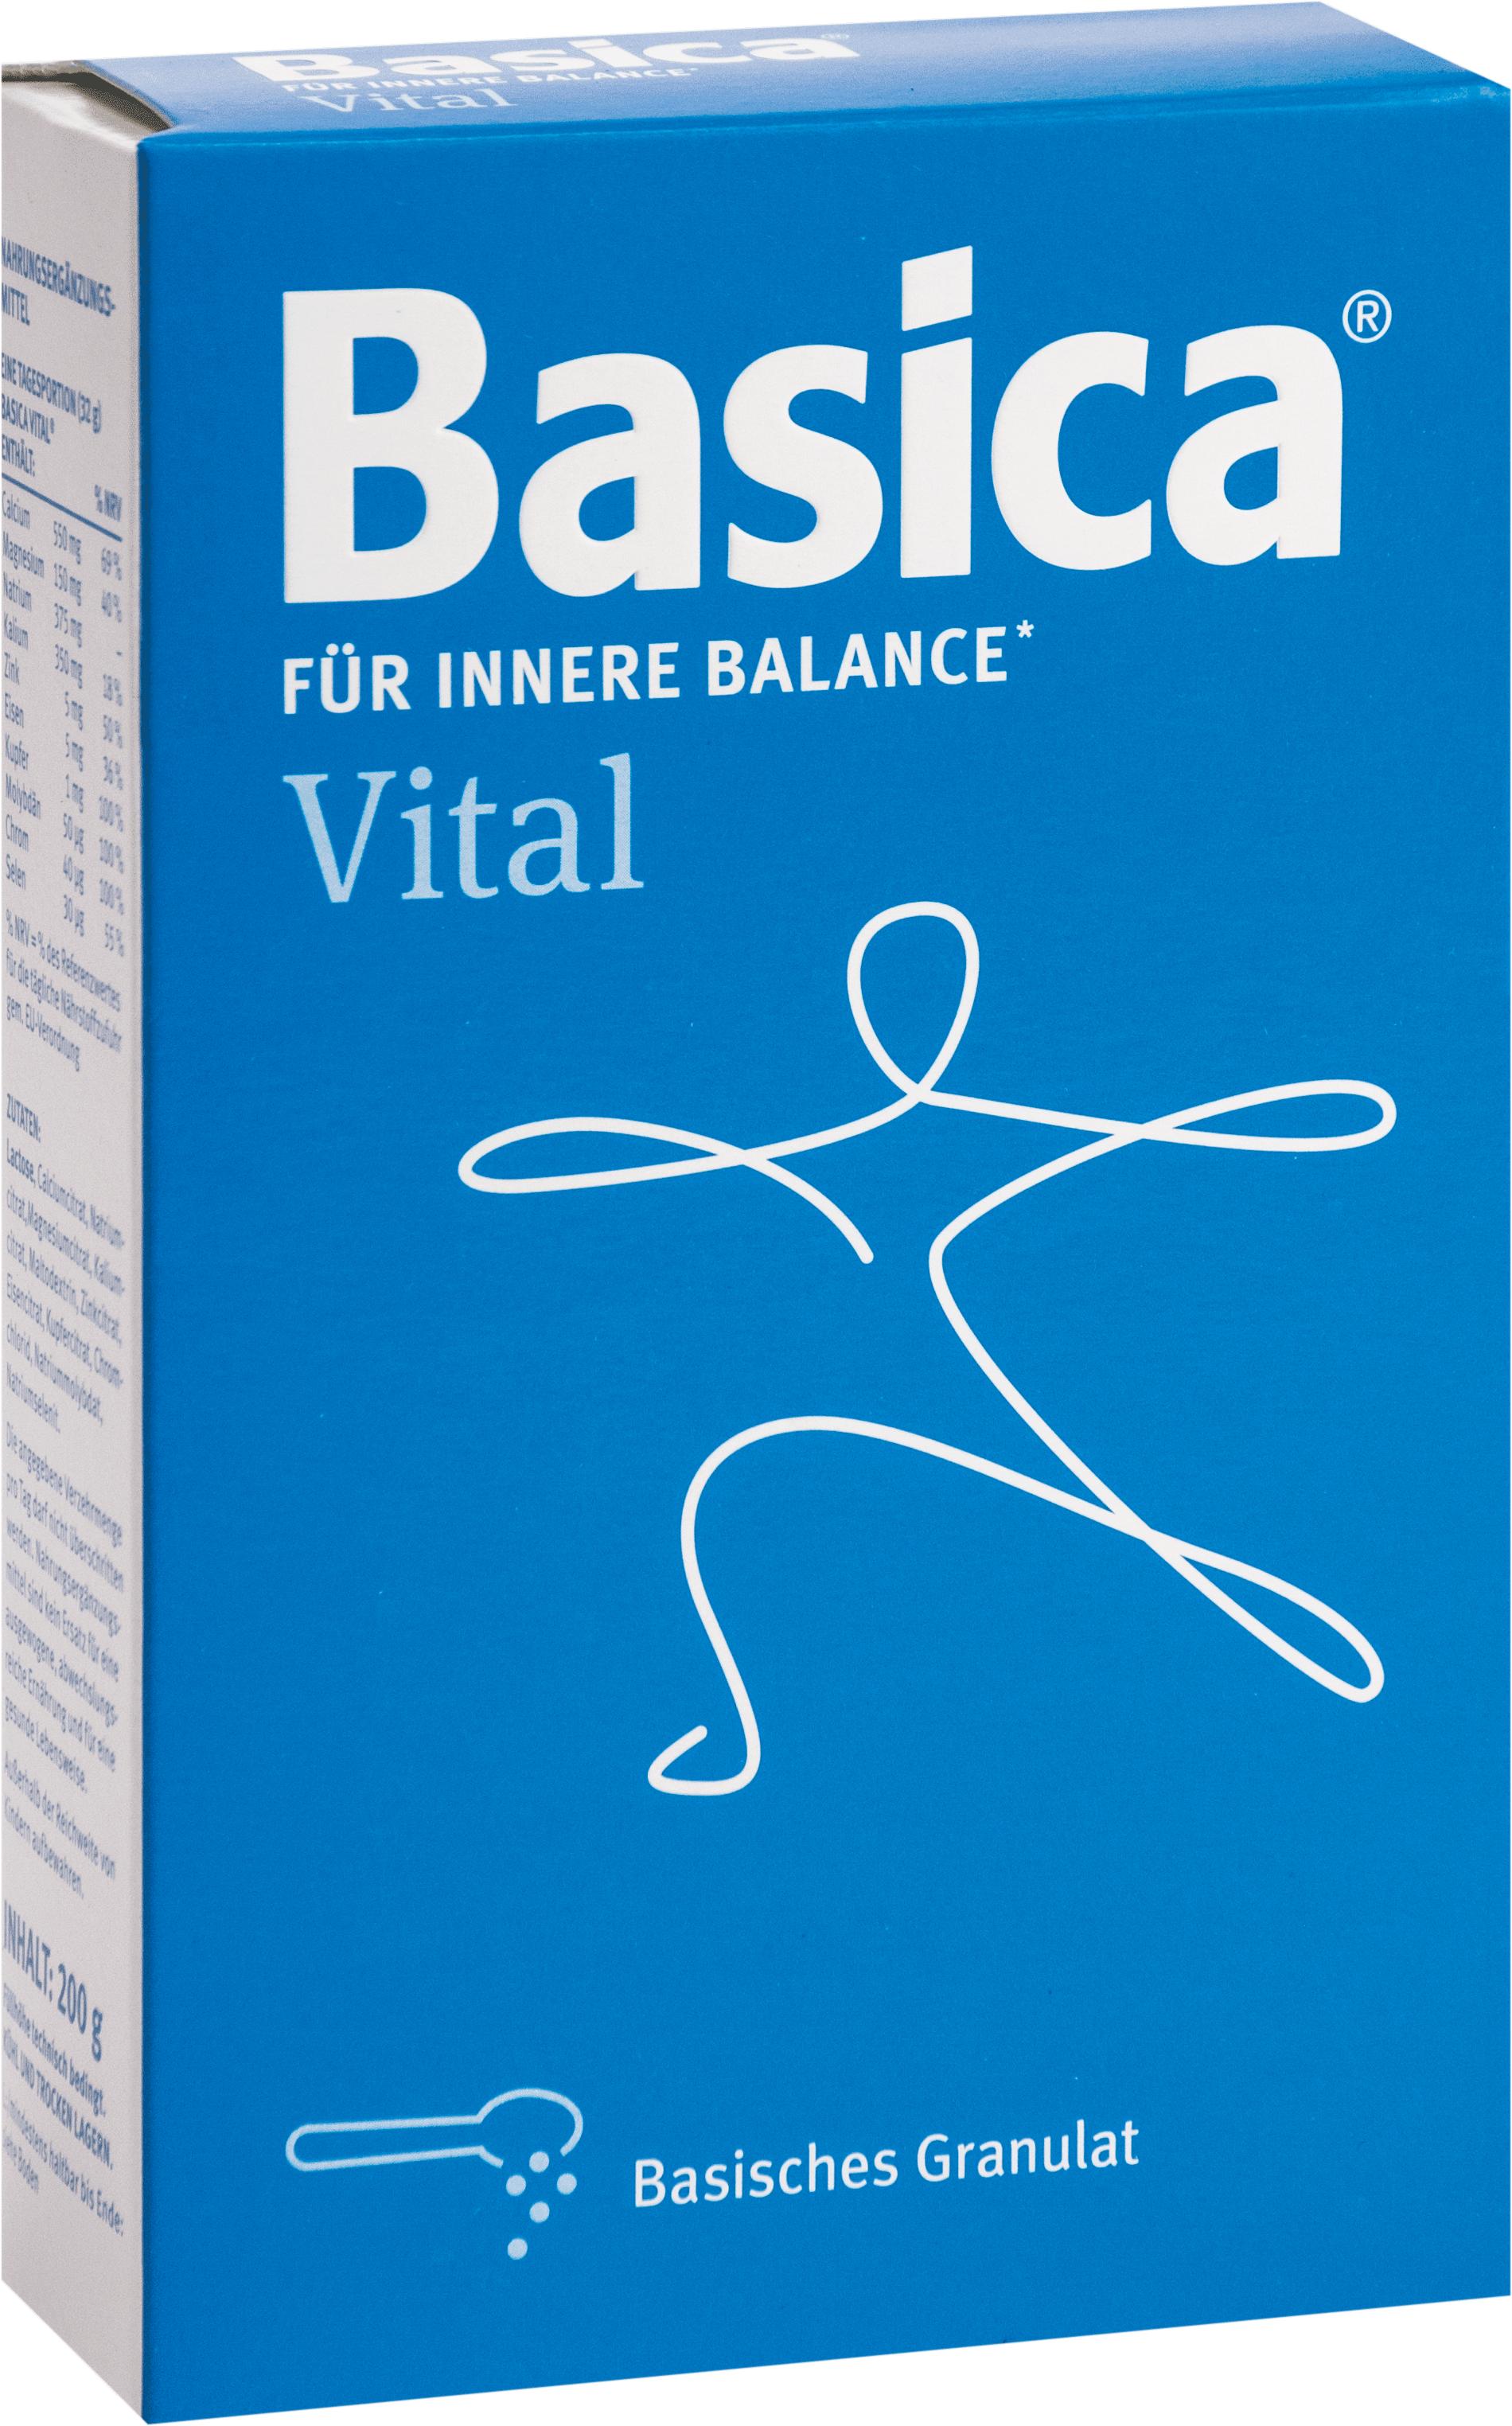 Basica Vital